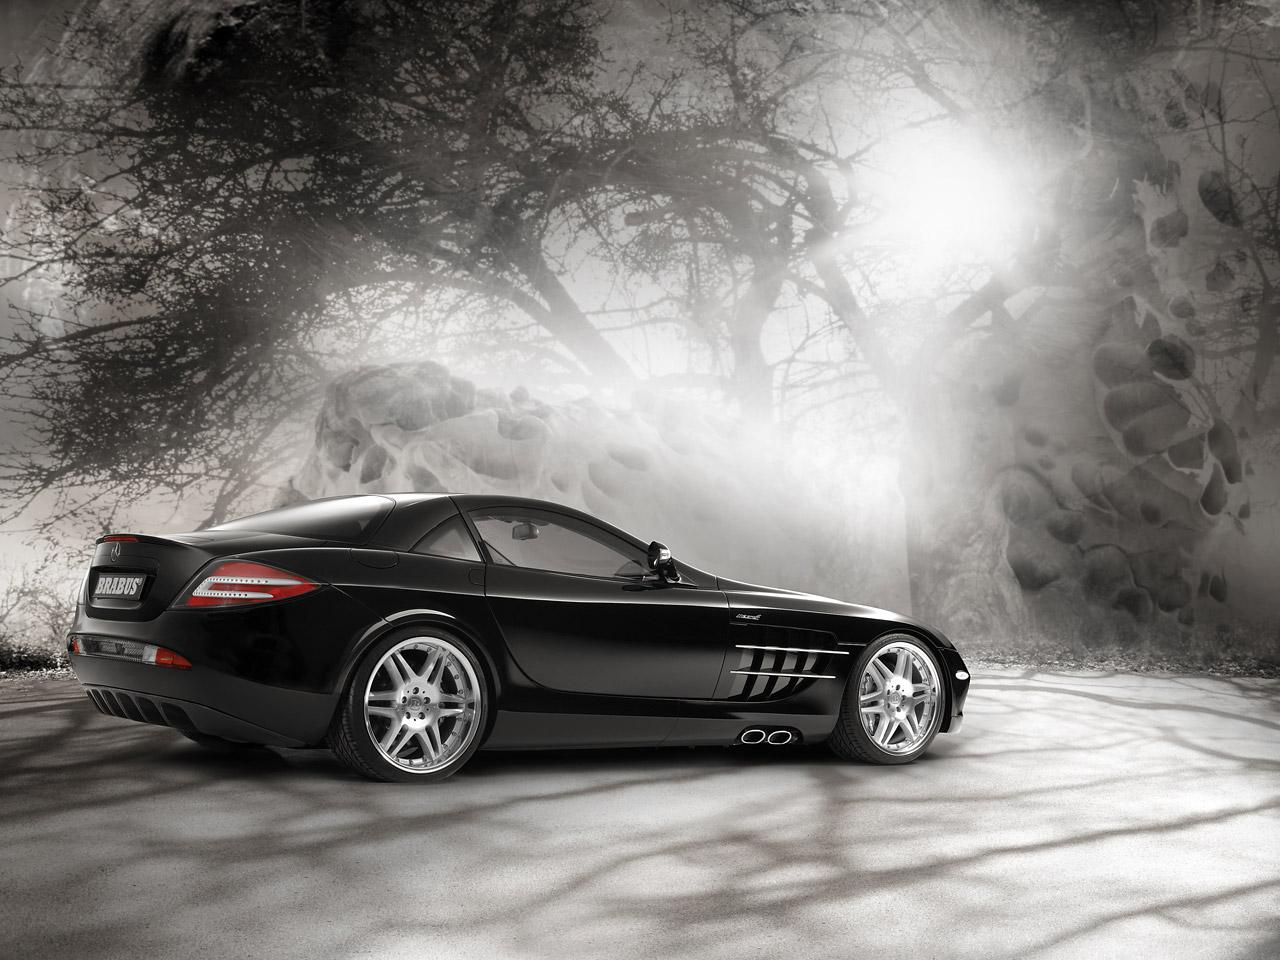 http://4.bp.blogspot.com/-JL498QYqAeA/T0Bn4w55jnI/AAAAAAAAMDc/-p3XqBbsass/s1600/Brabus-SLR-McLaren-Car.jpg